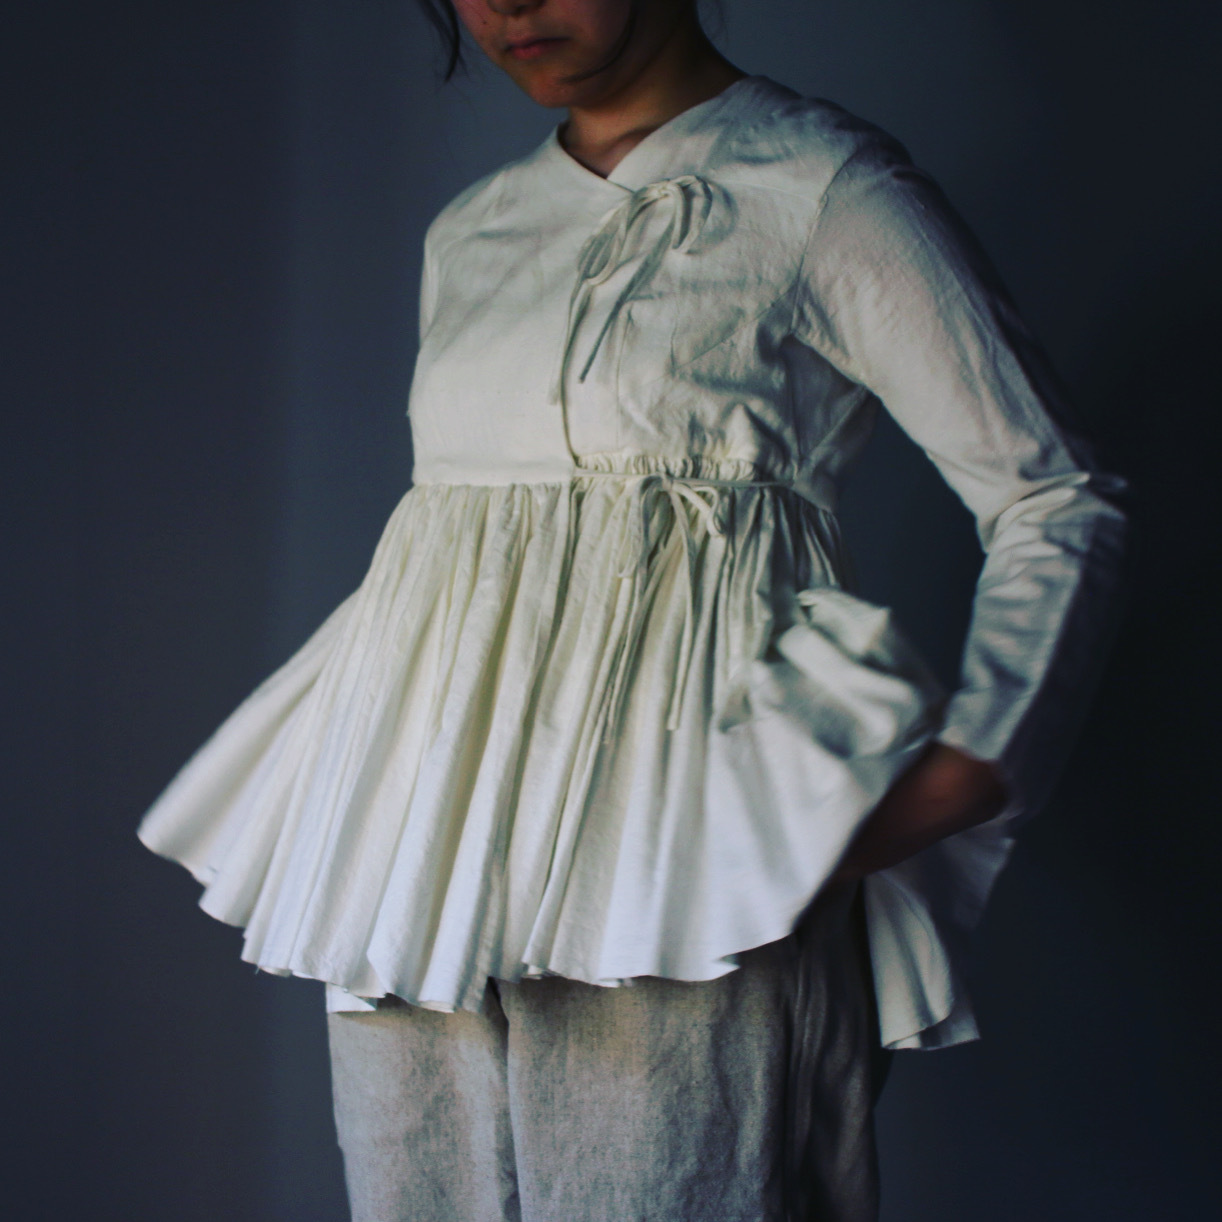 YAECA/ヤエカ ラップギャザーブラウス WHITE #69109